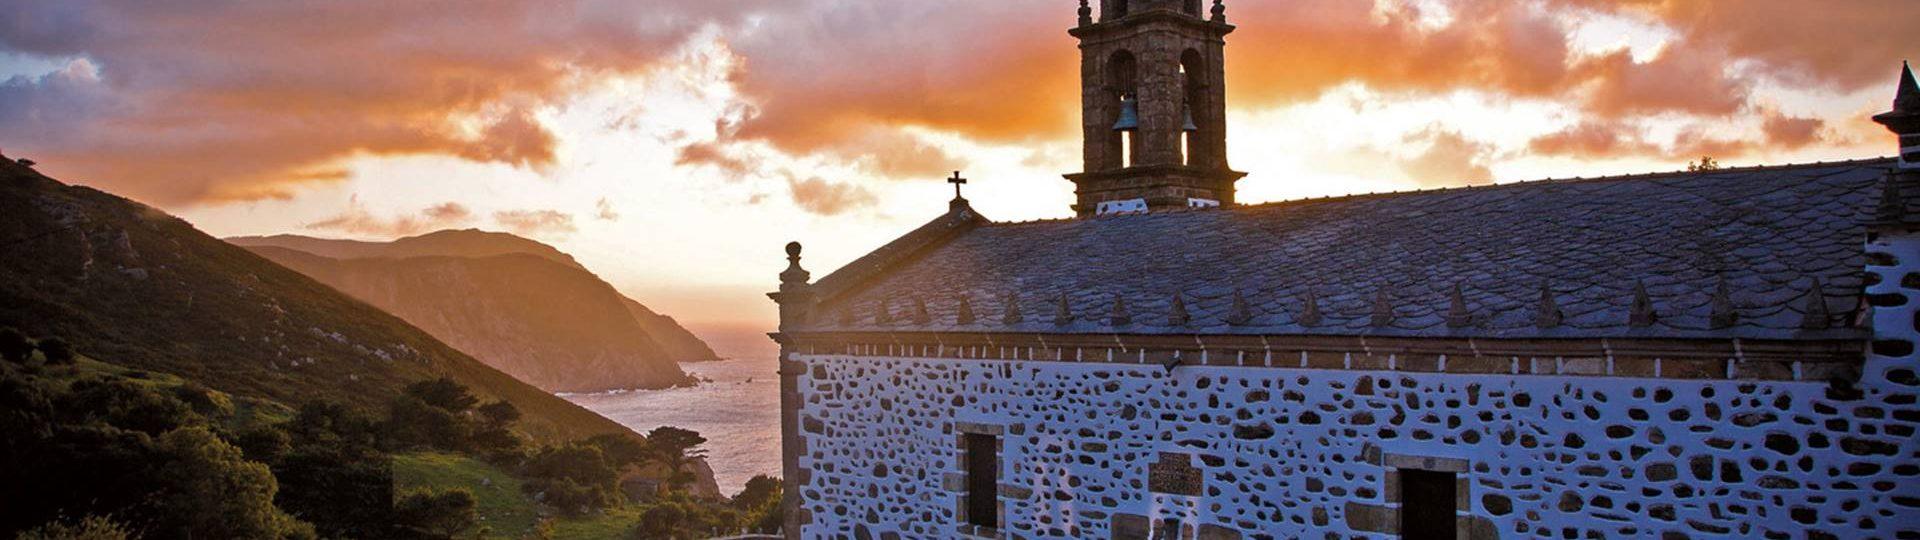 Acondicionamiento de San Andrés de Teixido